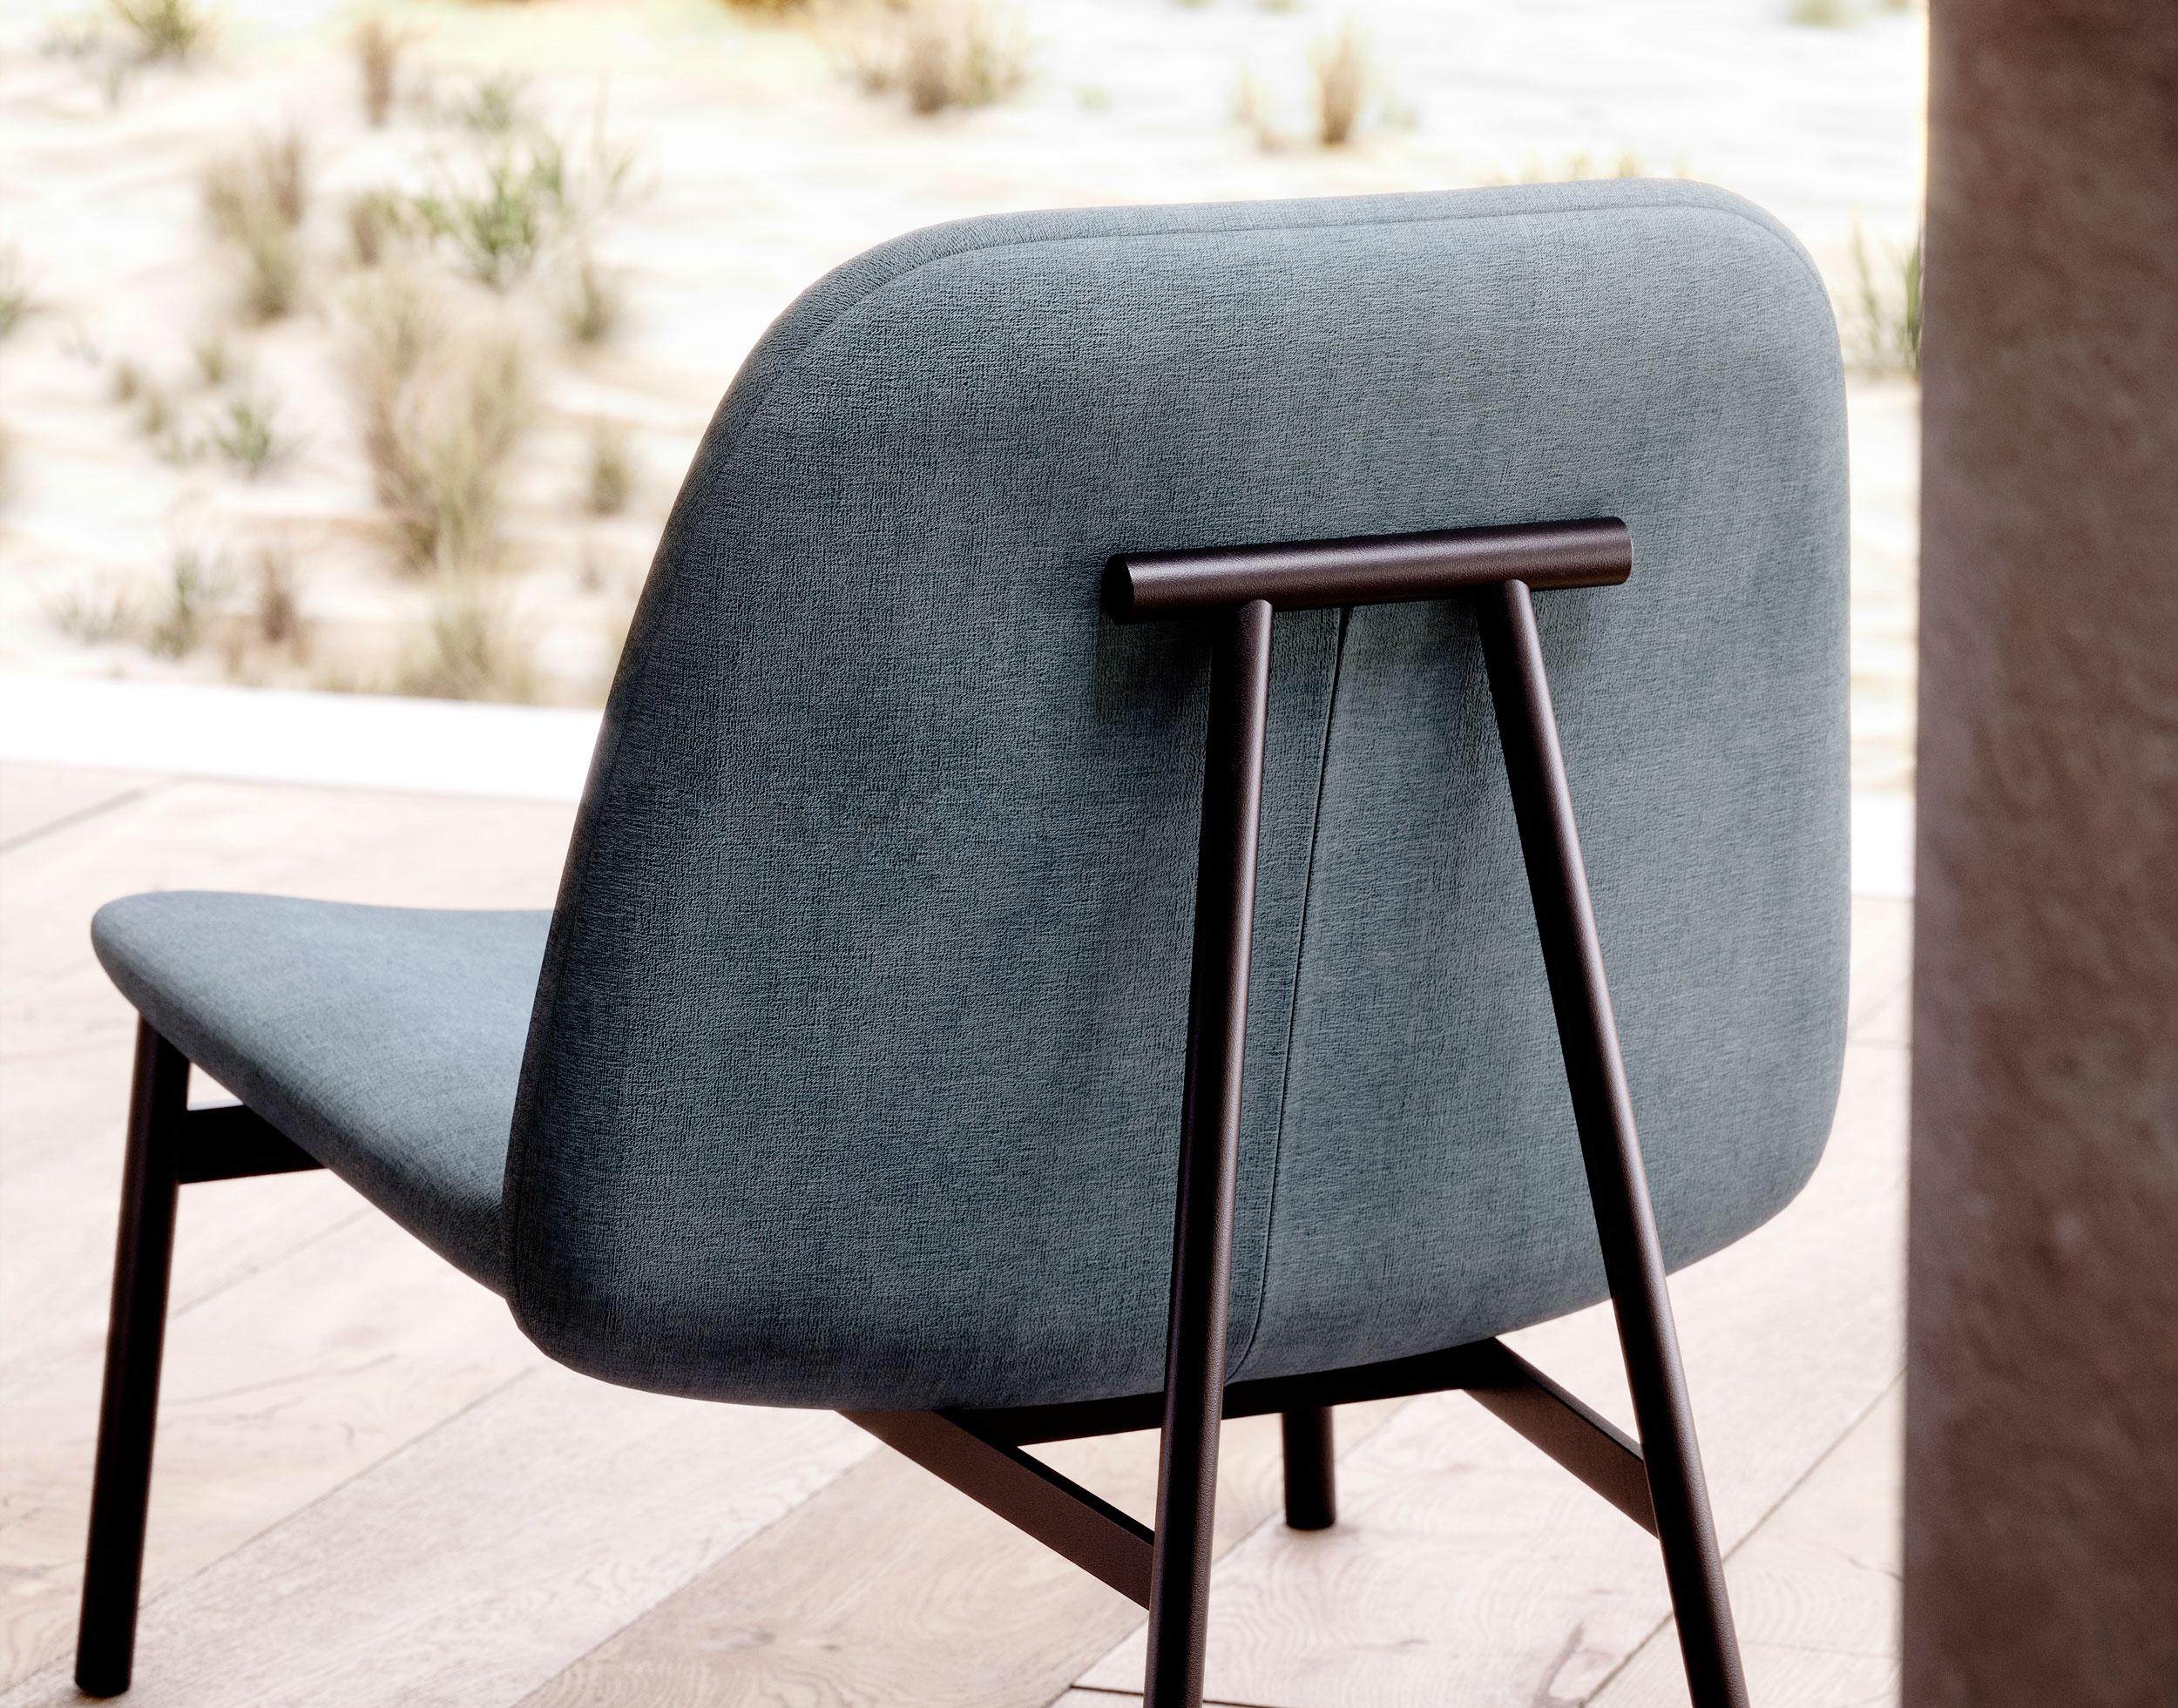 edison-armchair-domkapa-new-collection-2021-living-room-decor